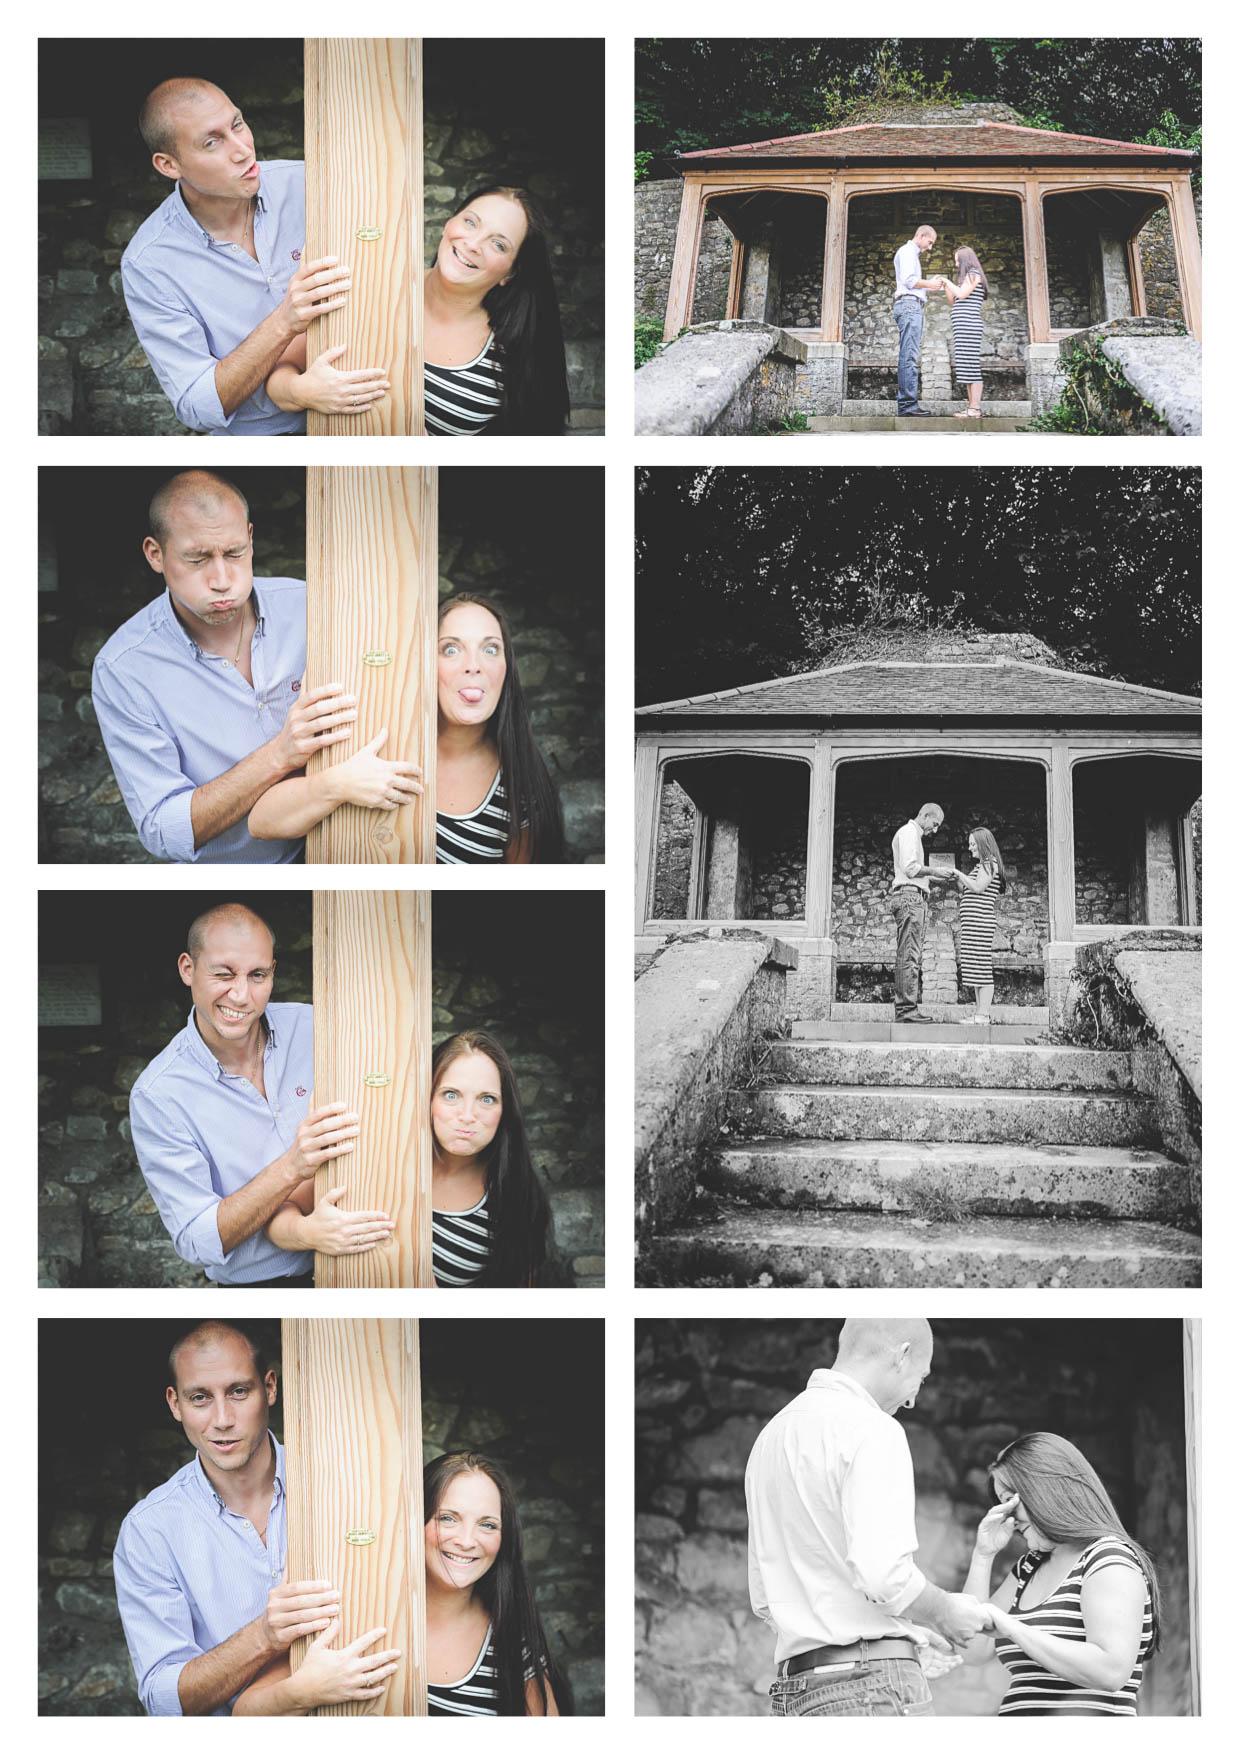 South Wales Wedding Photographer - Laura & Chris